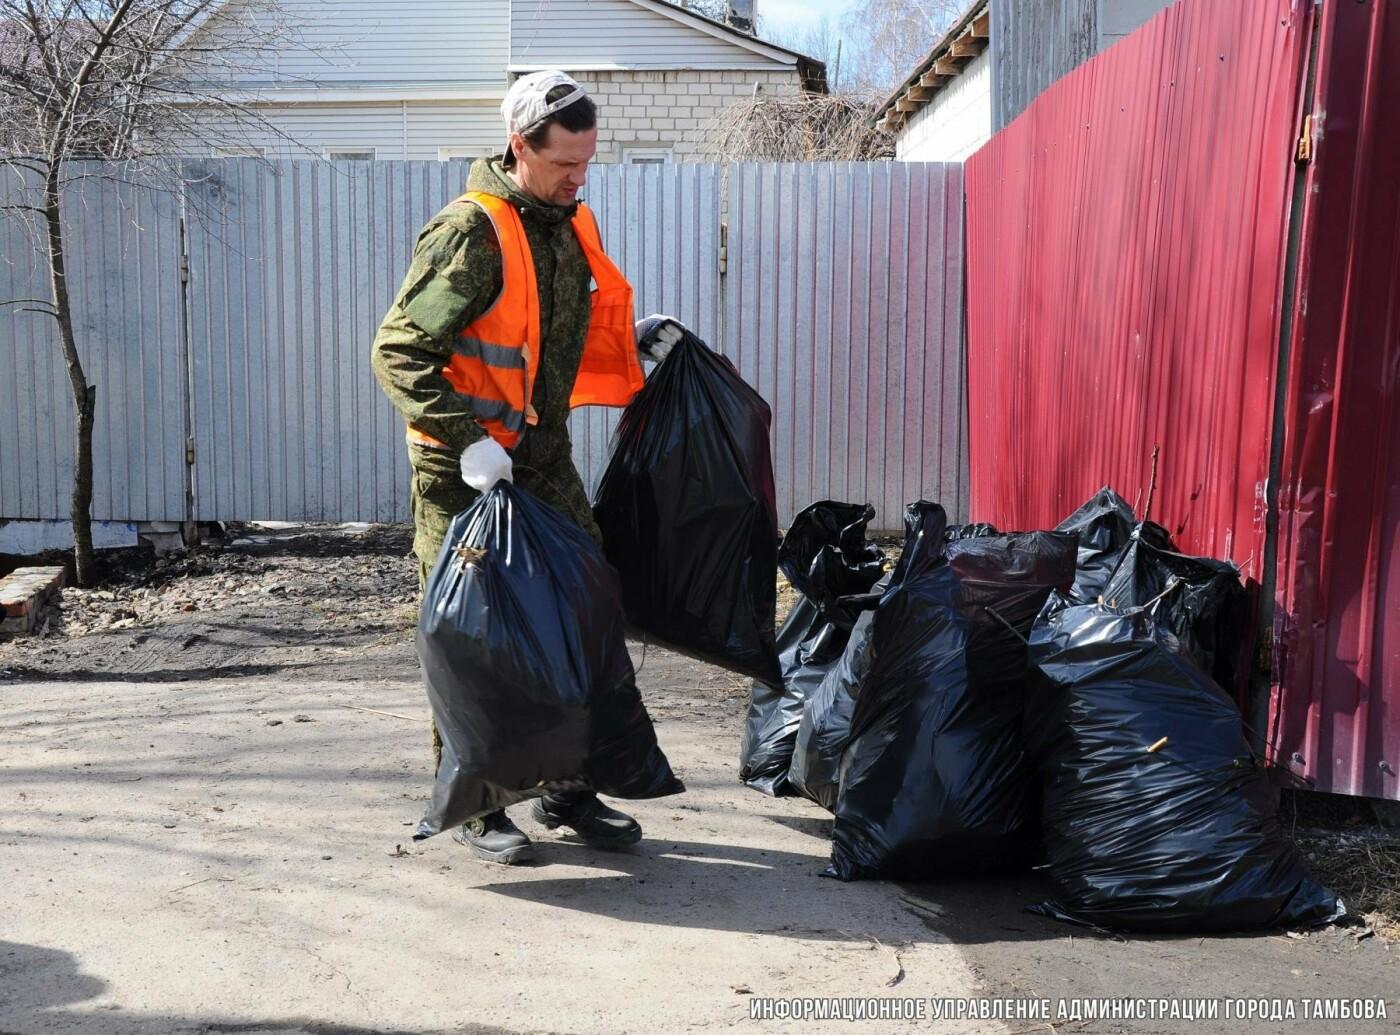 В Тамбове объявили всеобщую чистку, фото-1